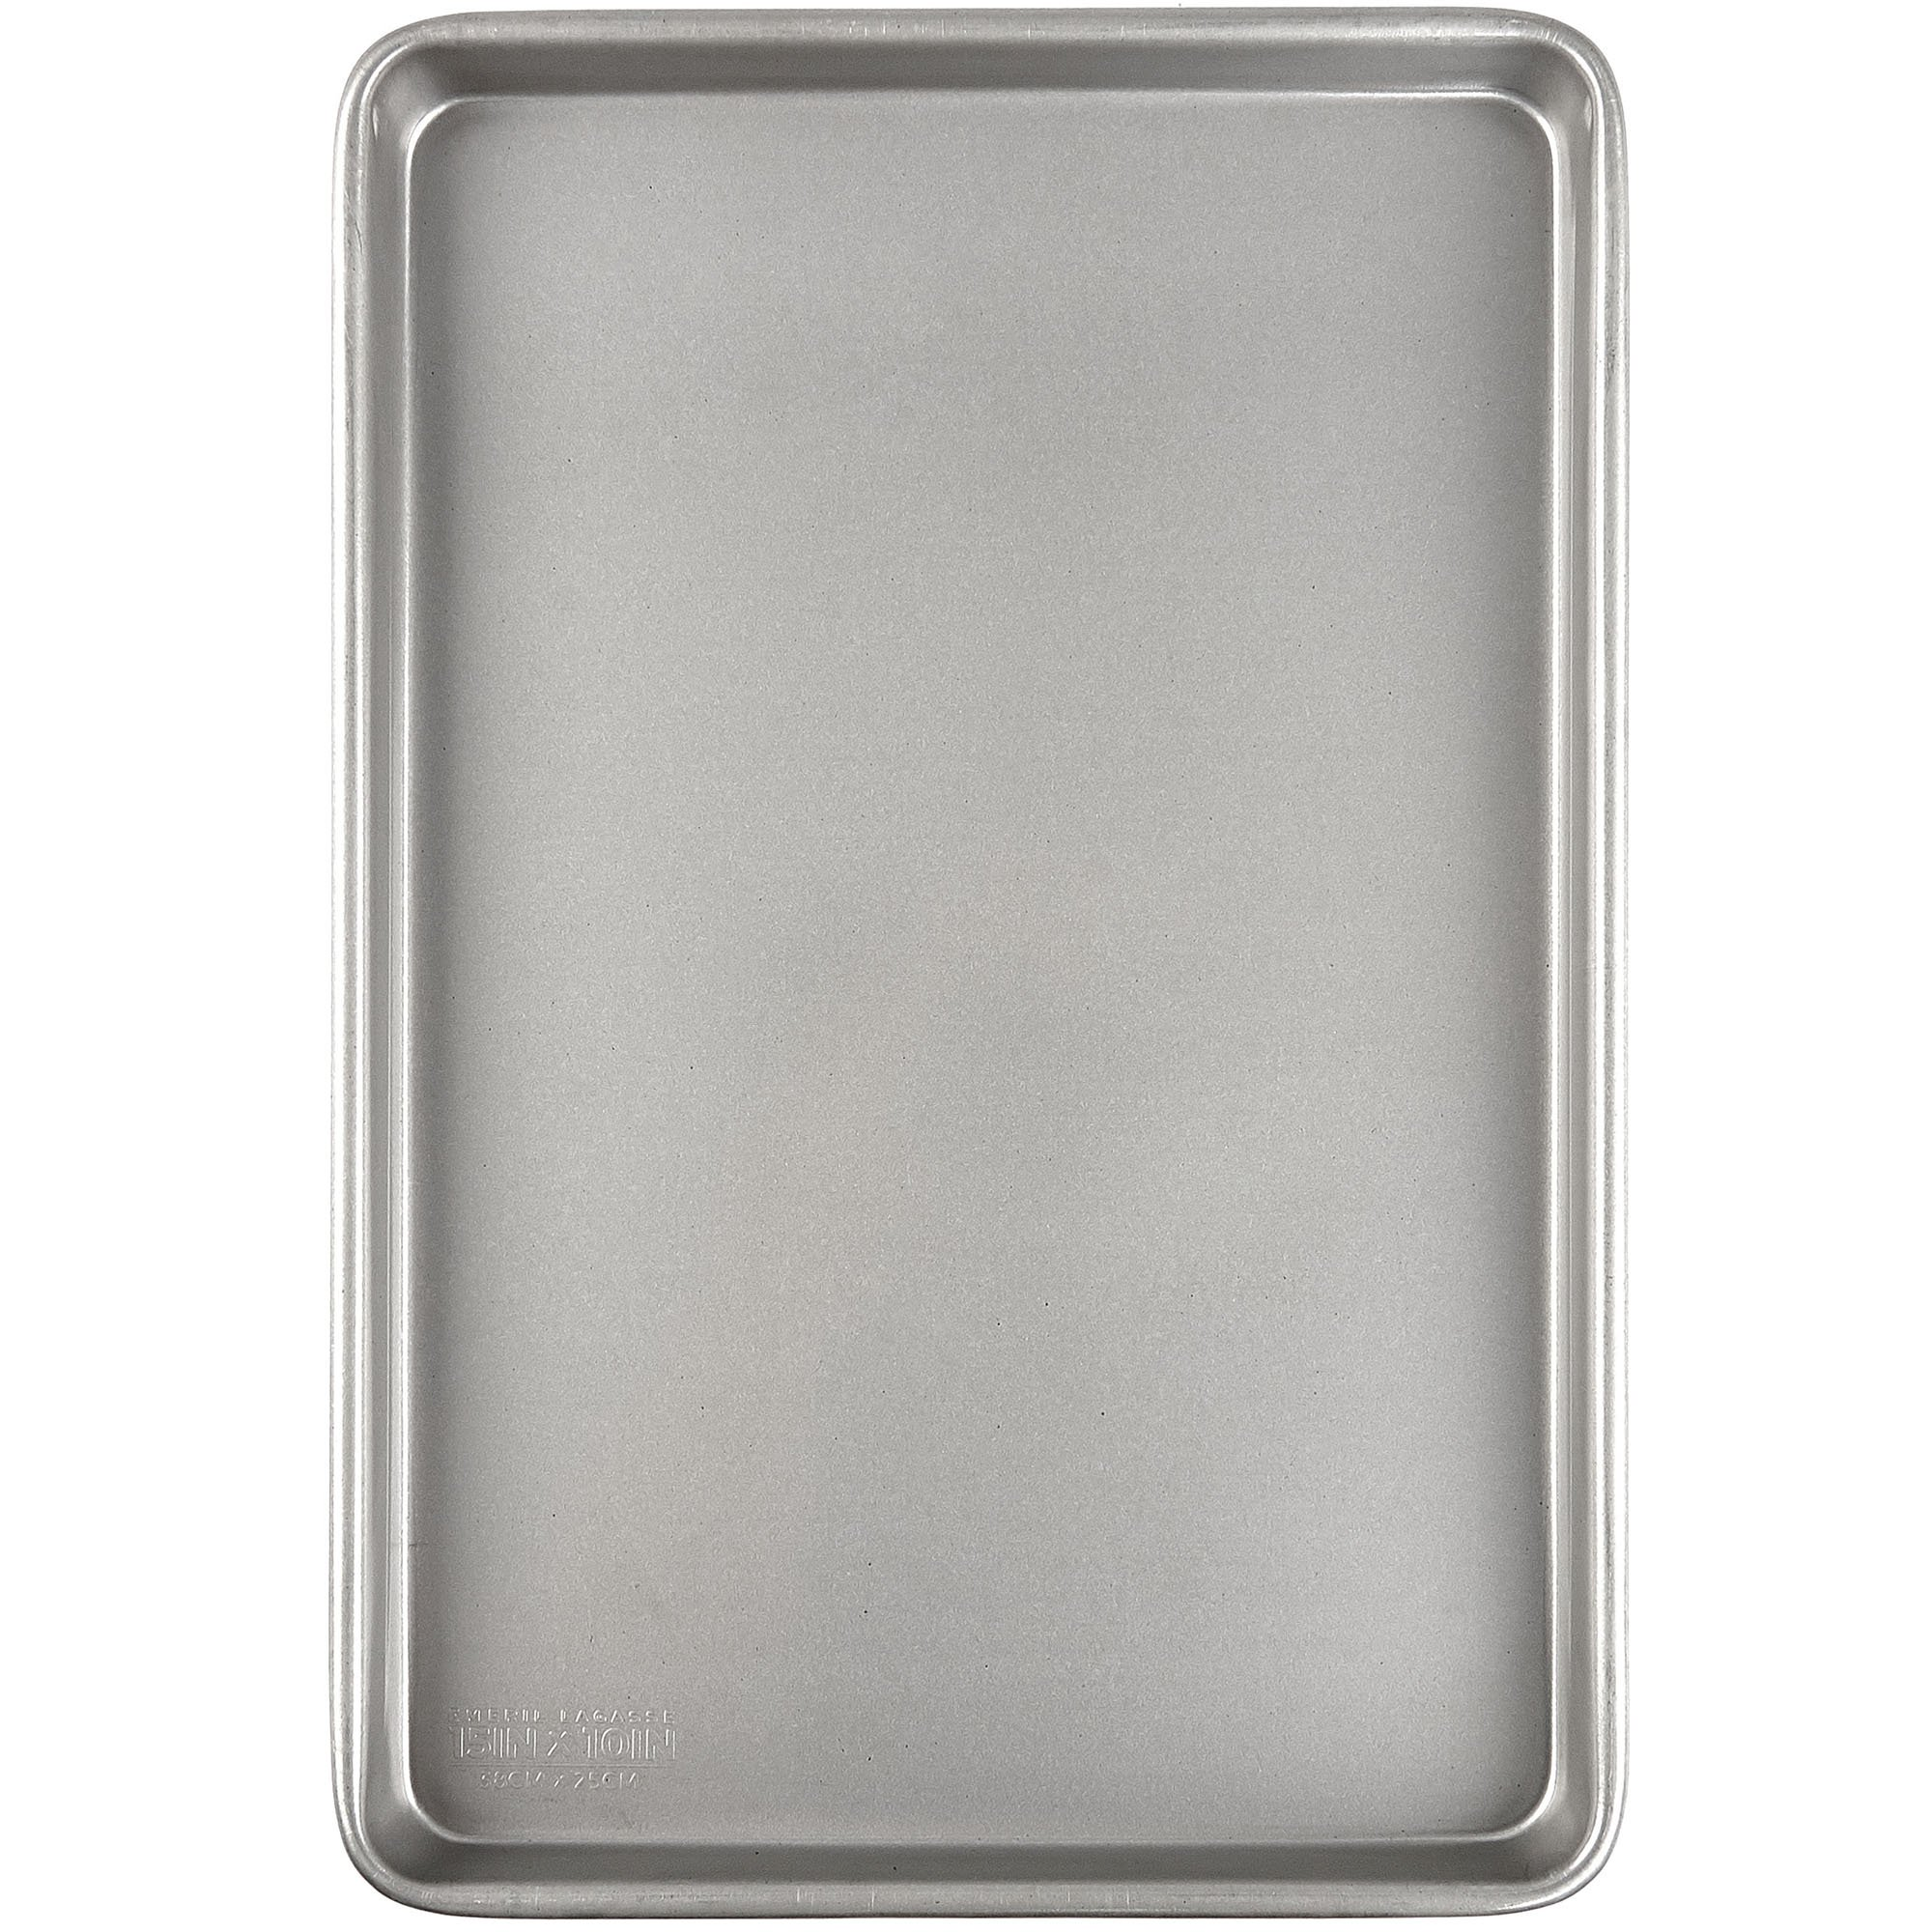 Emeril Lagasse 62670 Aluminized Steel Nonstick 5-Piece Bakeware Set by Emeril Lagasse (Image #1)